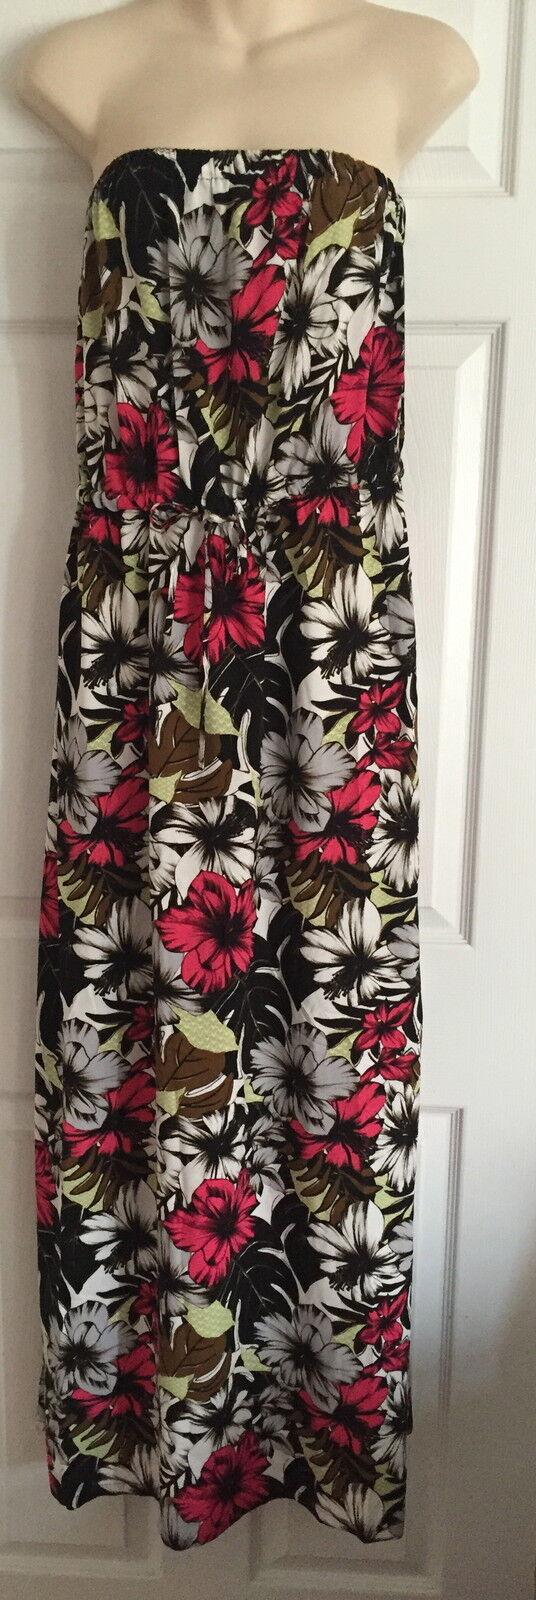 BNWT NEXTFLORAL LONG MAXI BOOBTUBE  DRESS SIZE 14 16